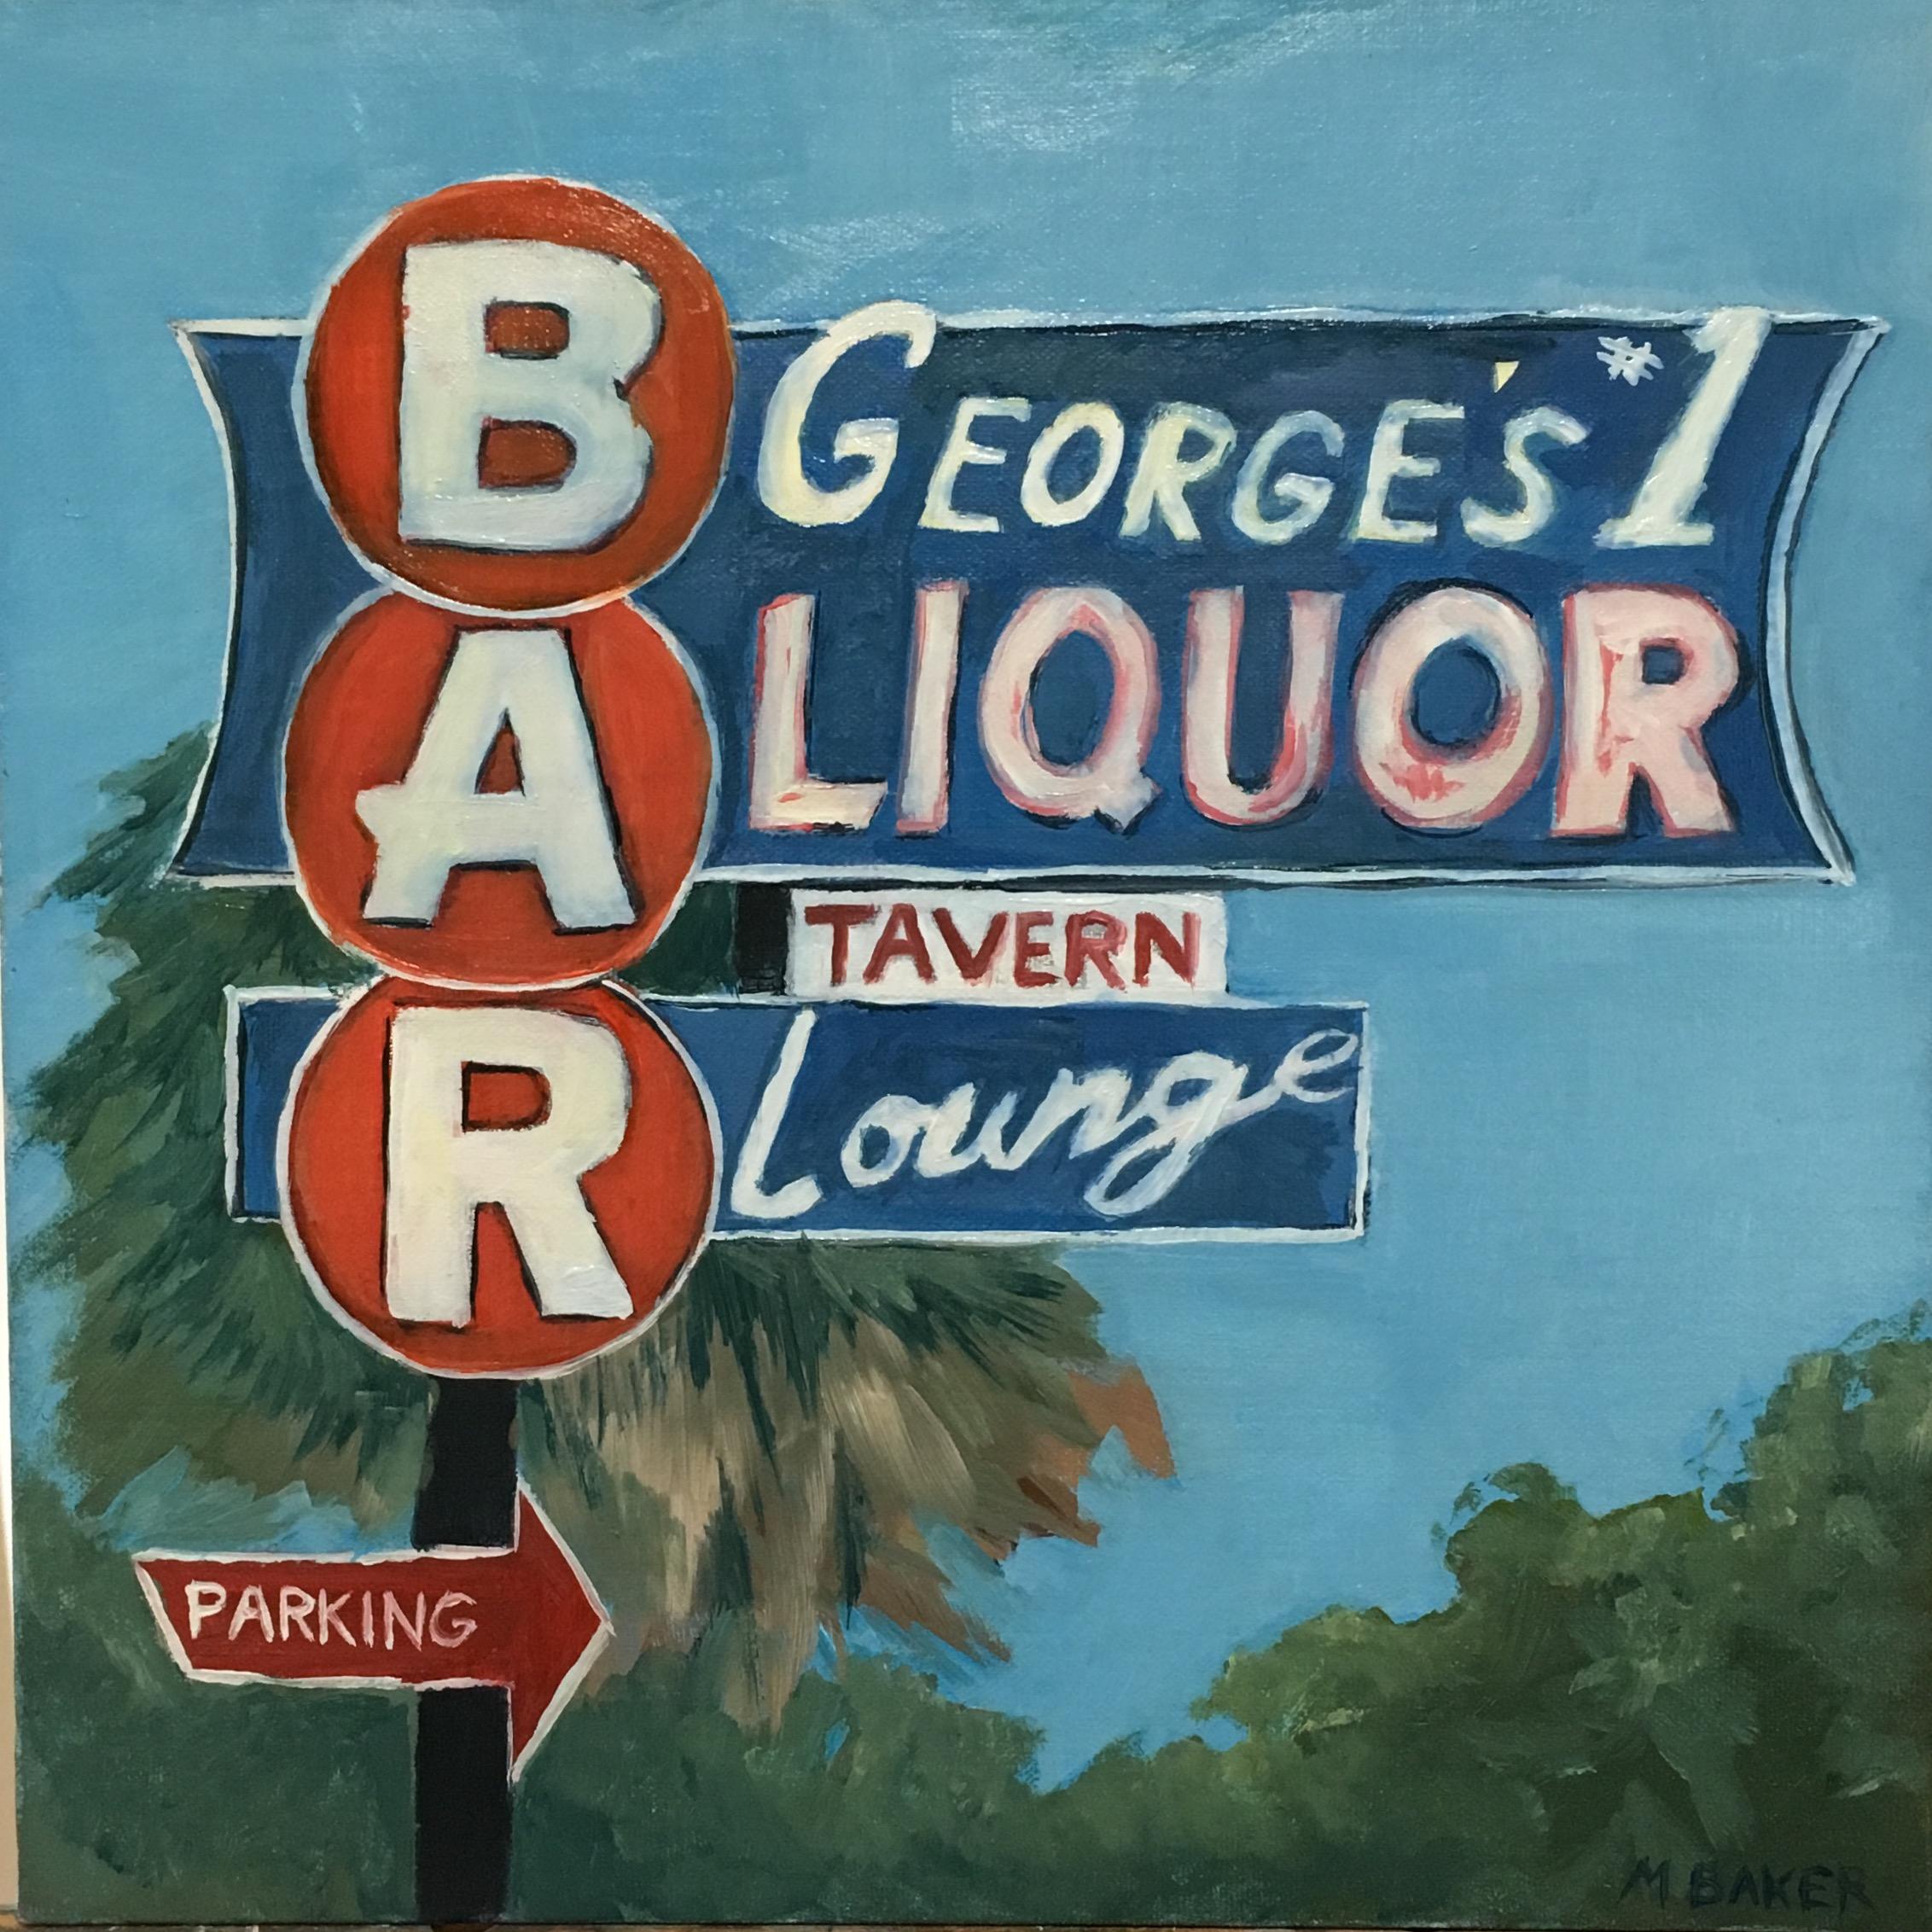 George's #1